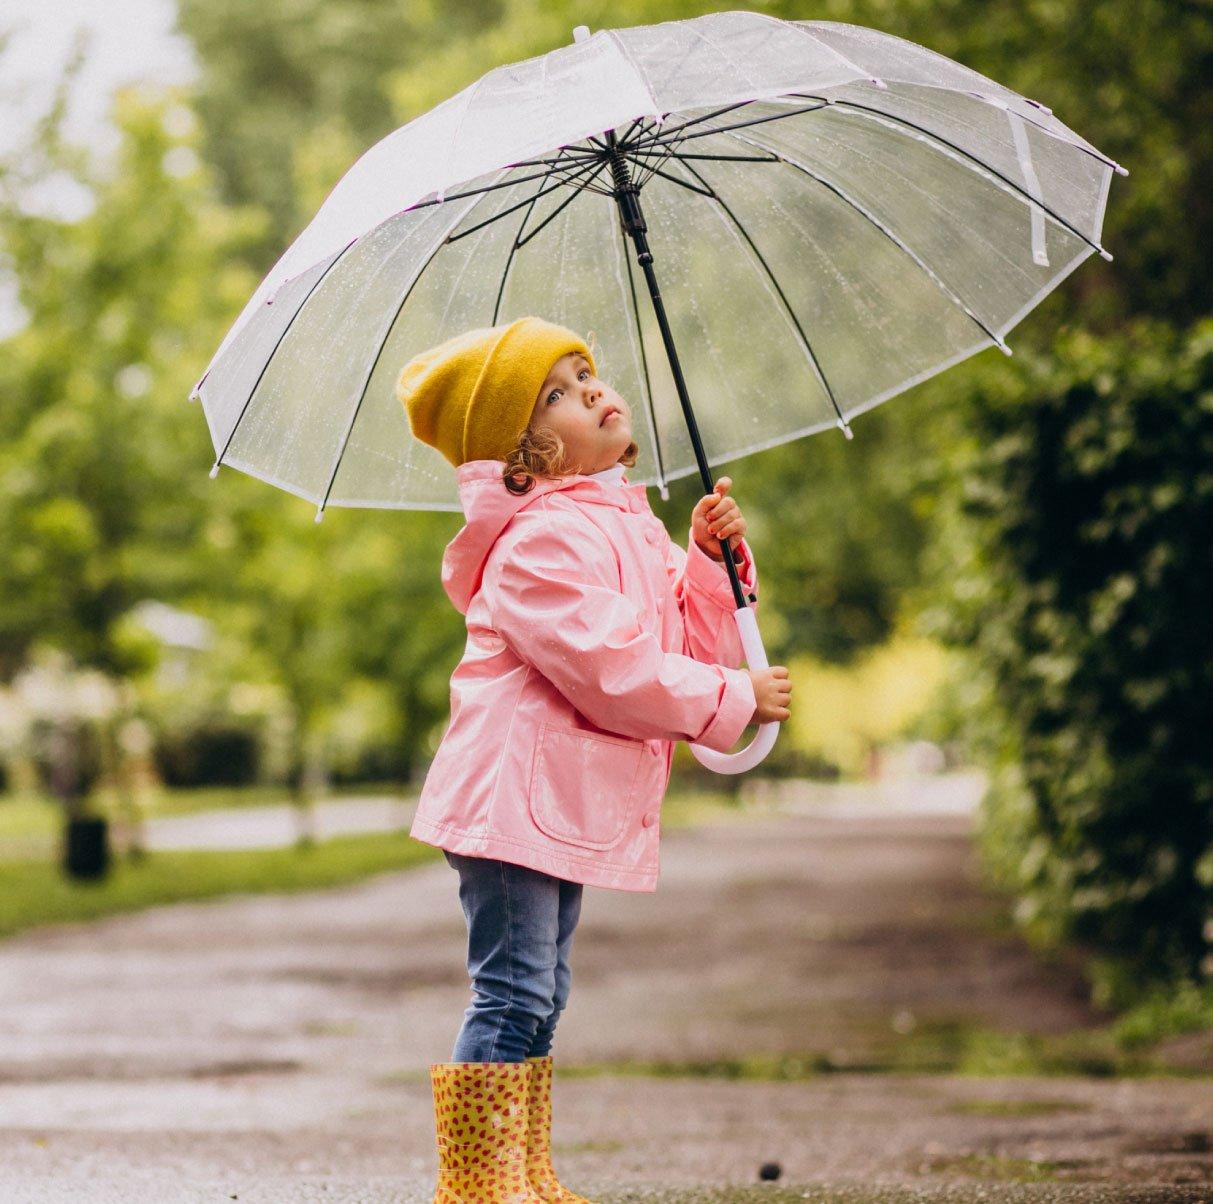 Rainfall predictoin using machine learning